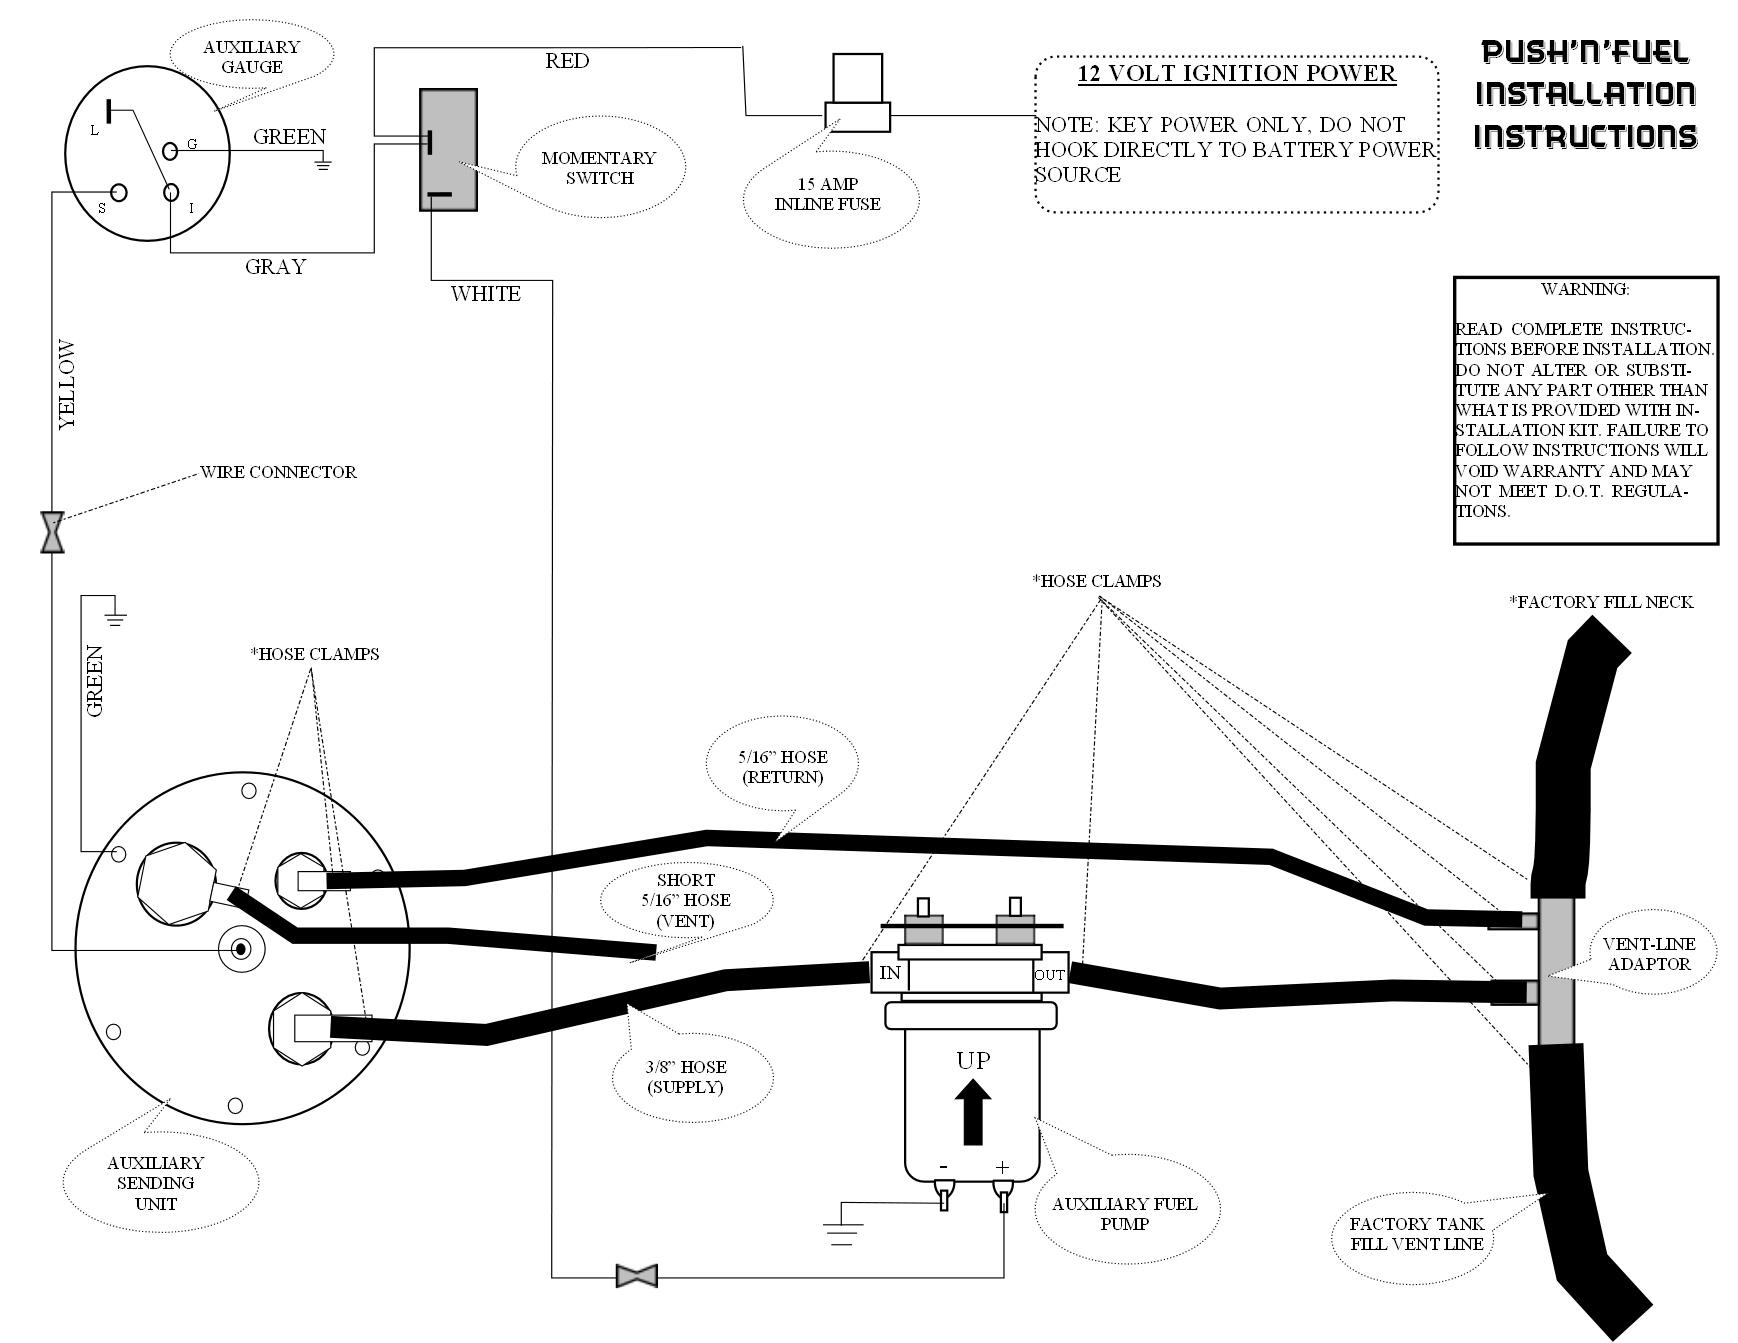 pushnfuel_diagram.JPG